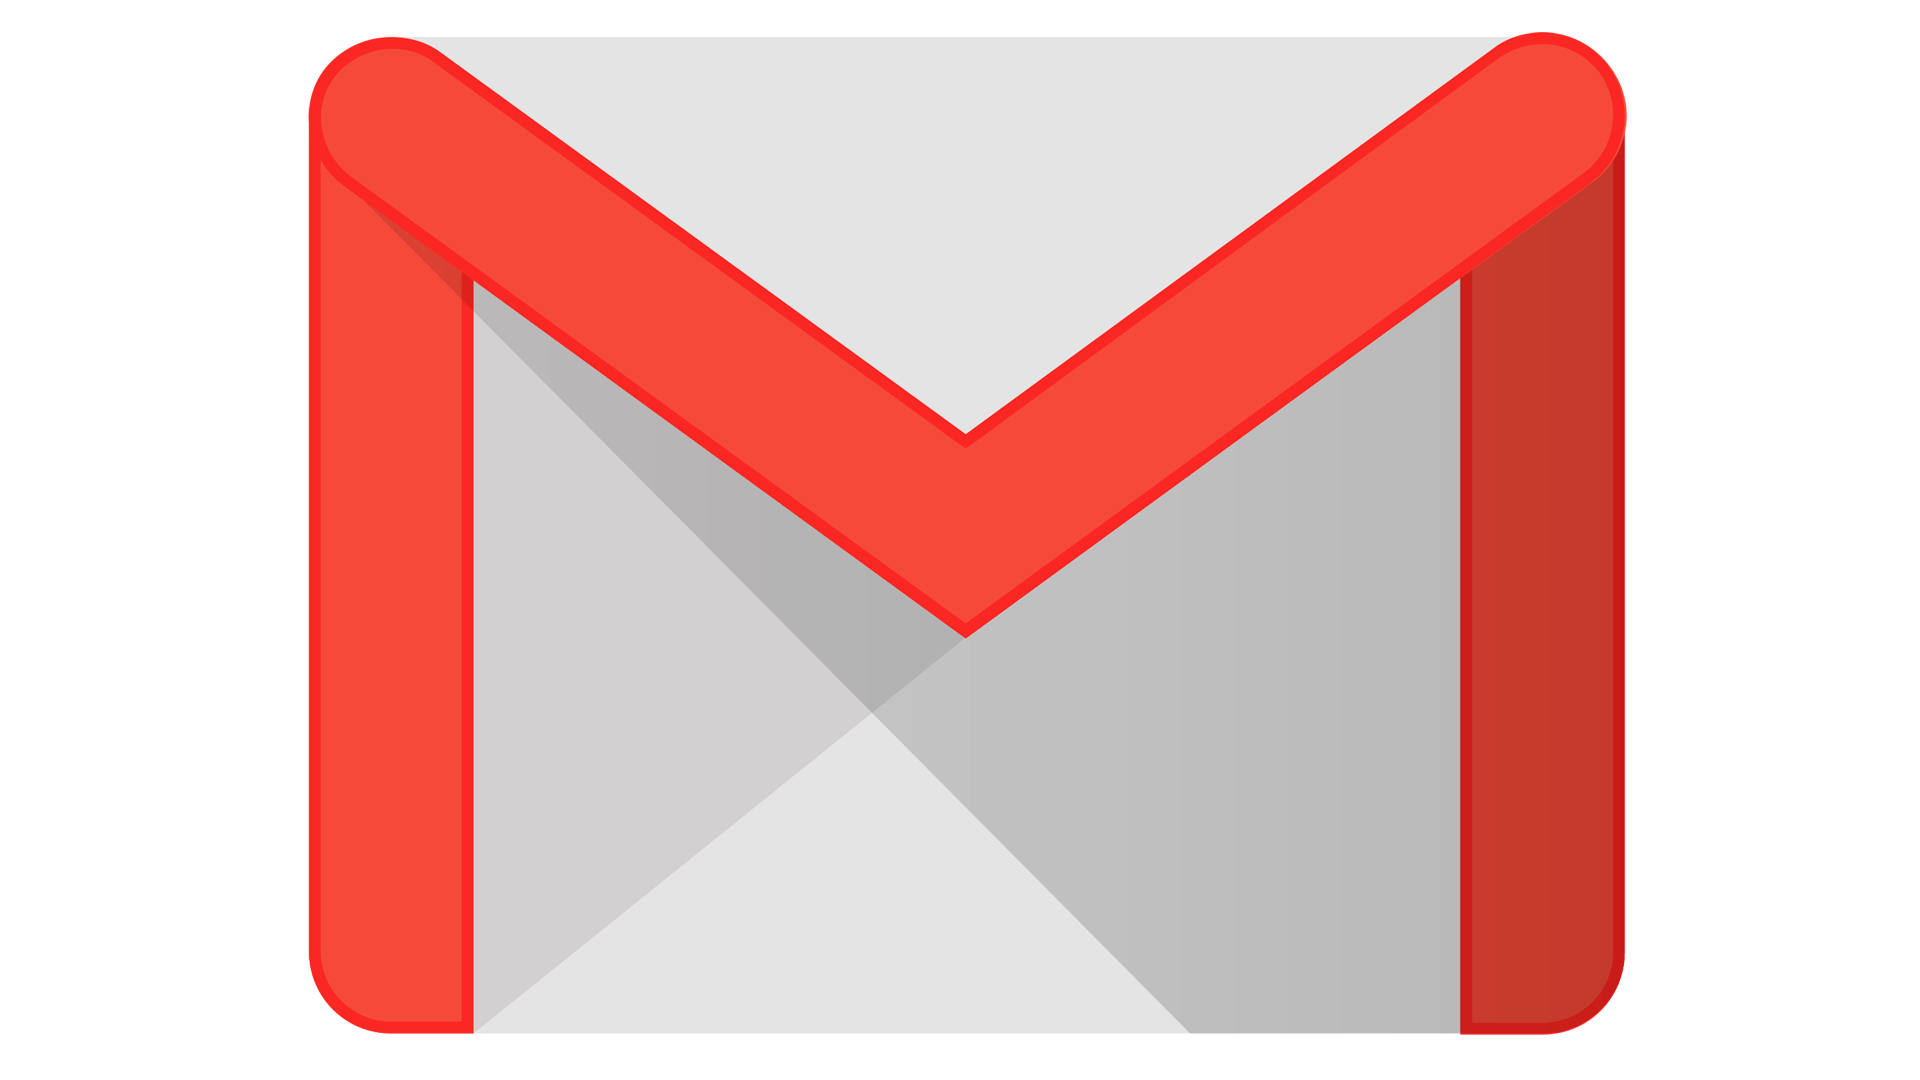 gmail-symbol-png-5.png